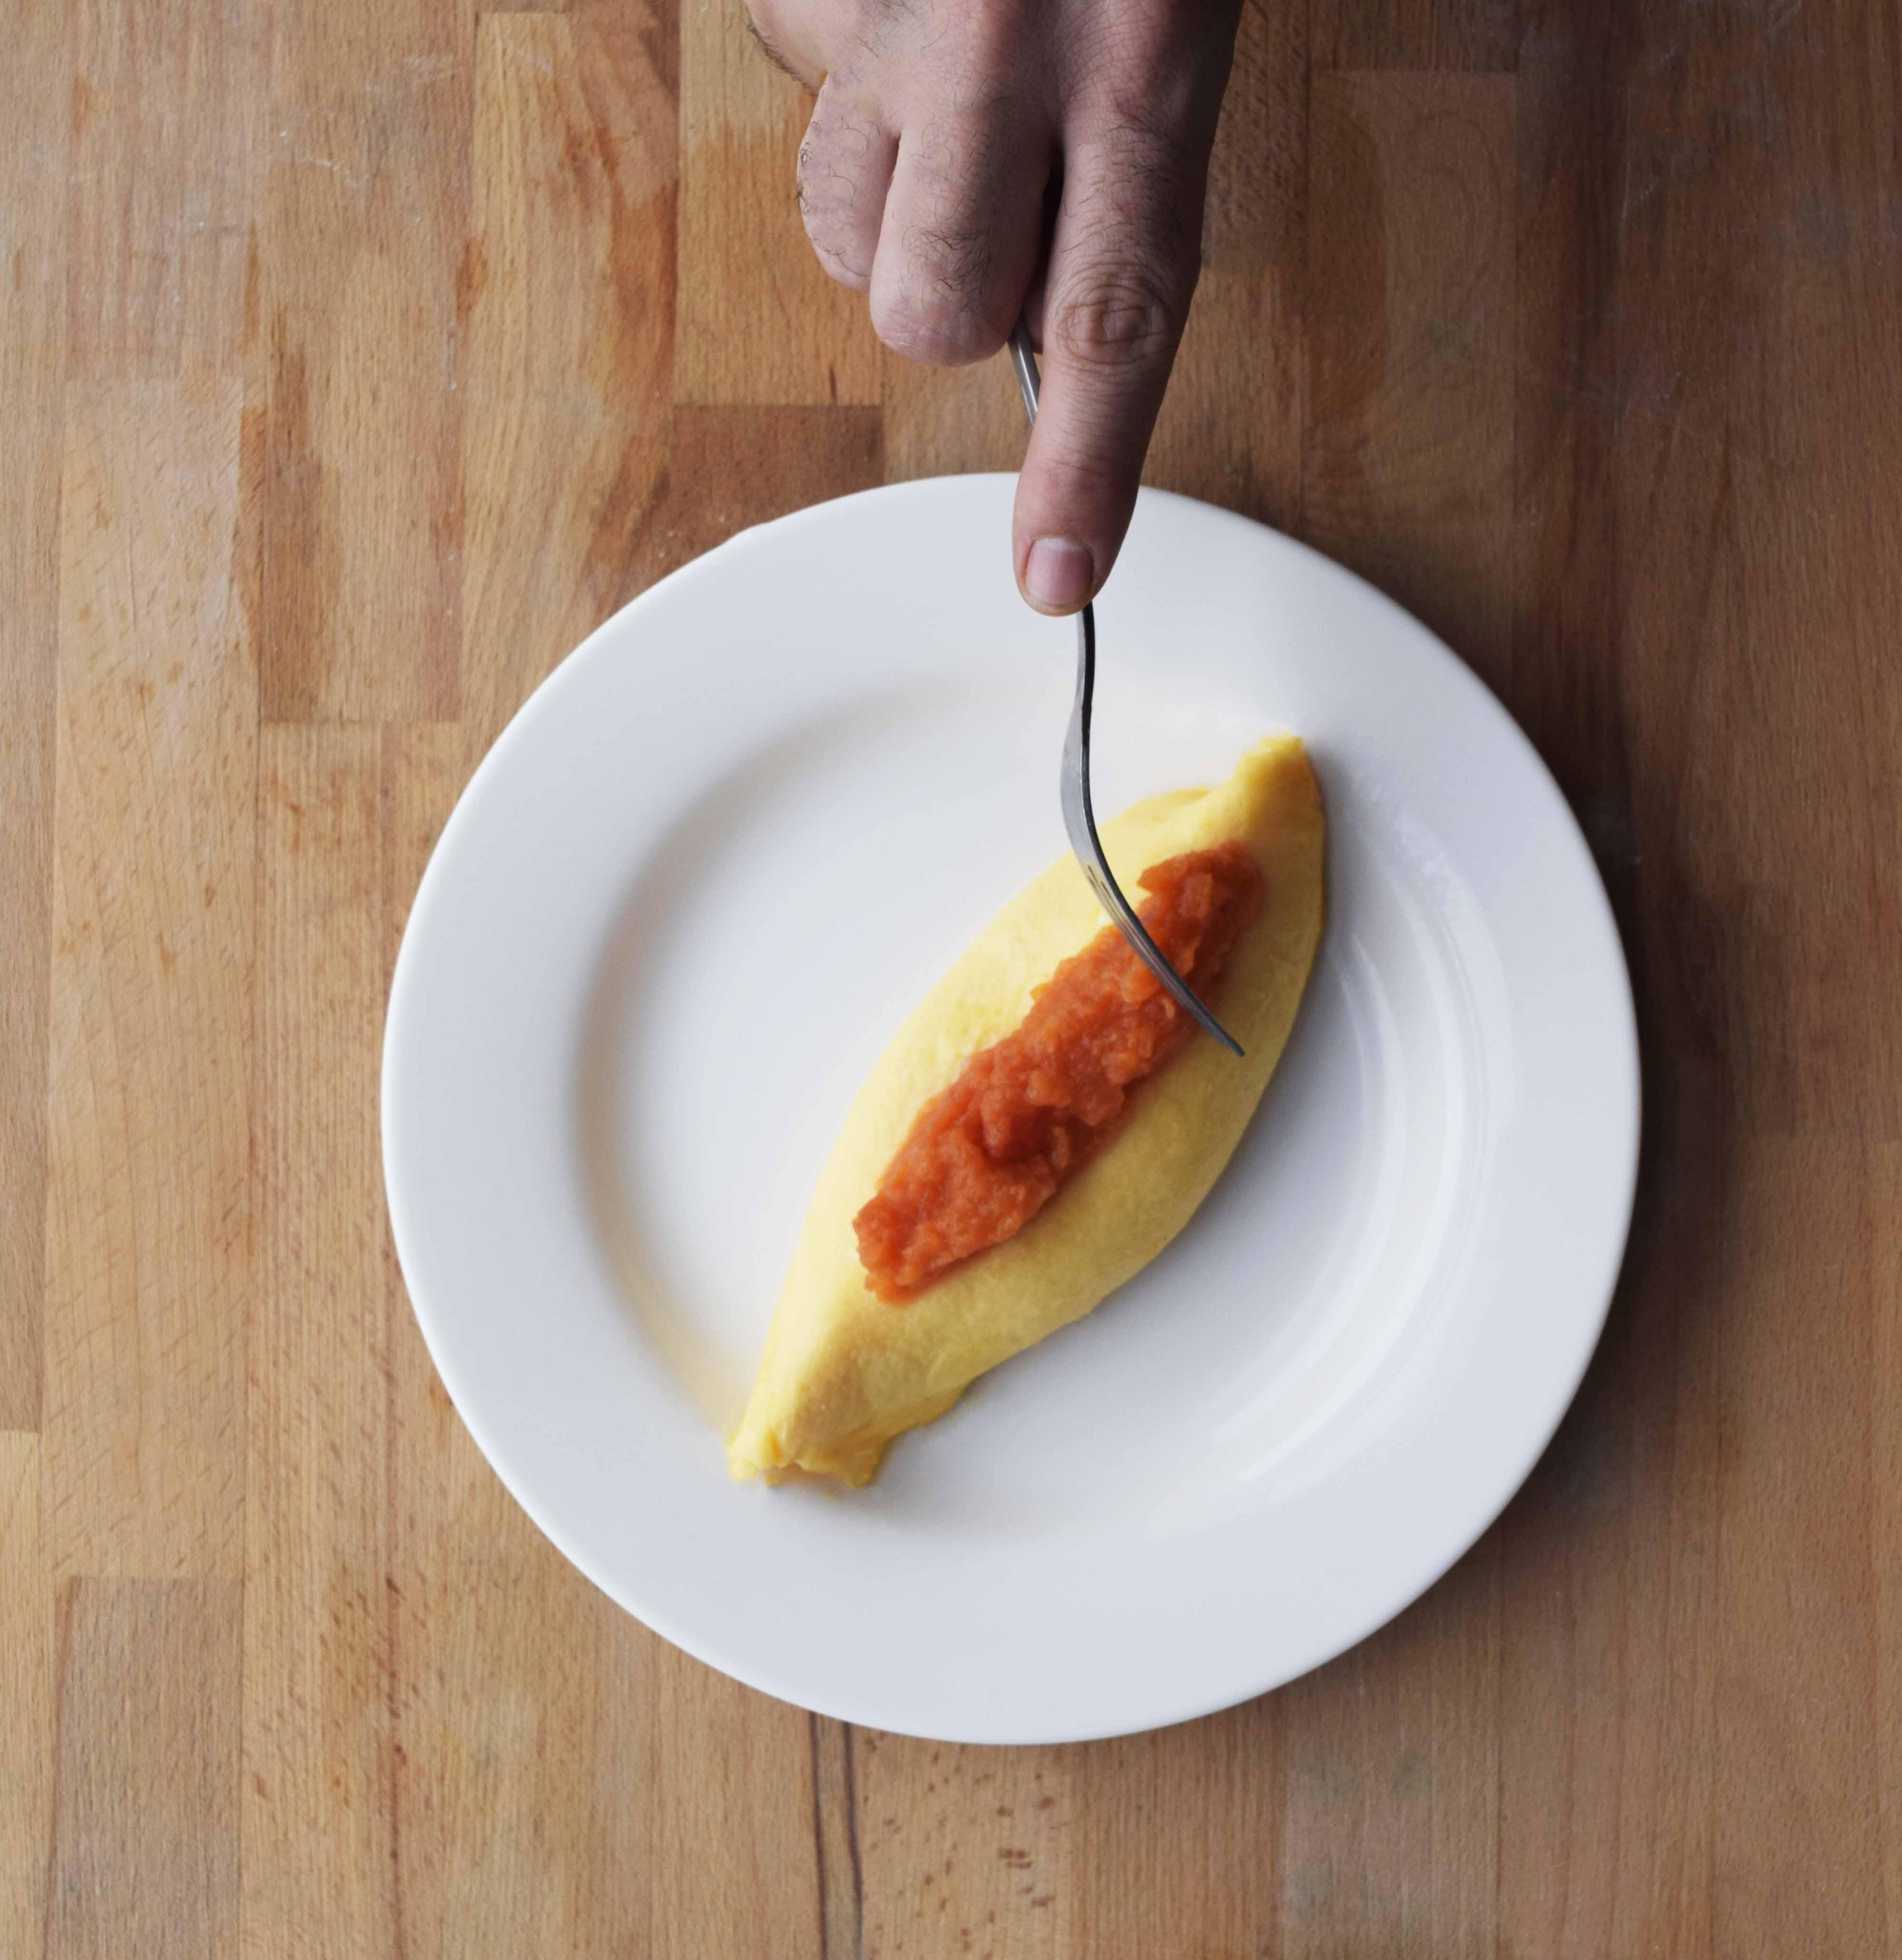 Photo courtesy of the Singapore Chefs Association